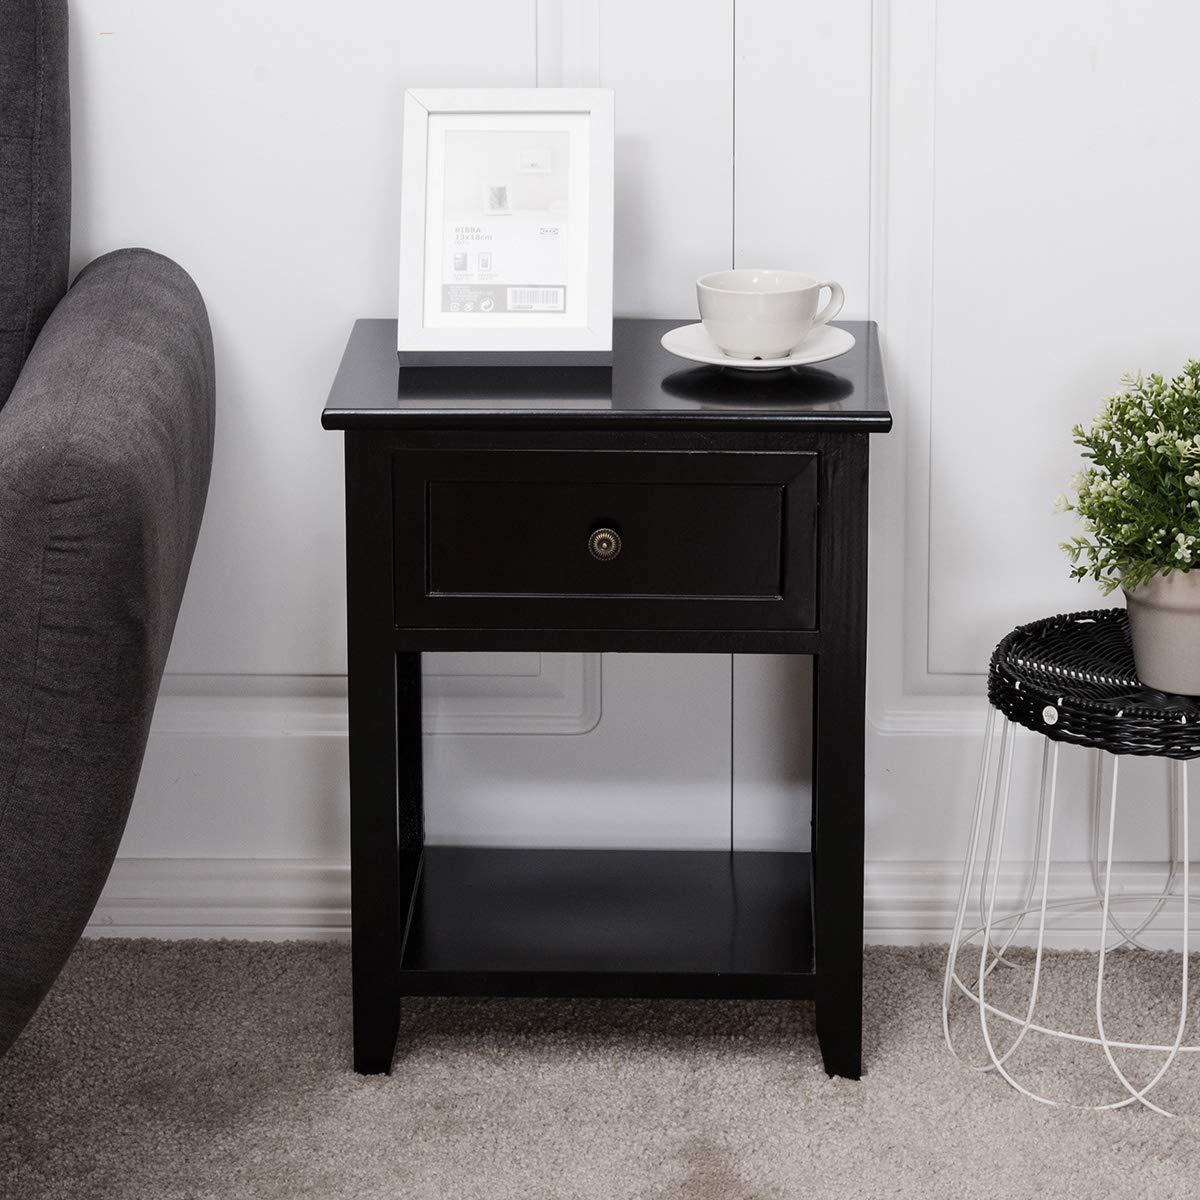 Giantex 2 Pcs Nightstand End Bedside Table Home Bedroom Furniture X-Shape W/Bottom Open Shelf Drawer, Black by Giantex (Image #4)